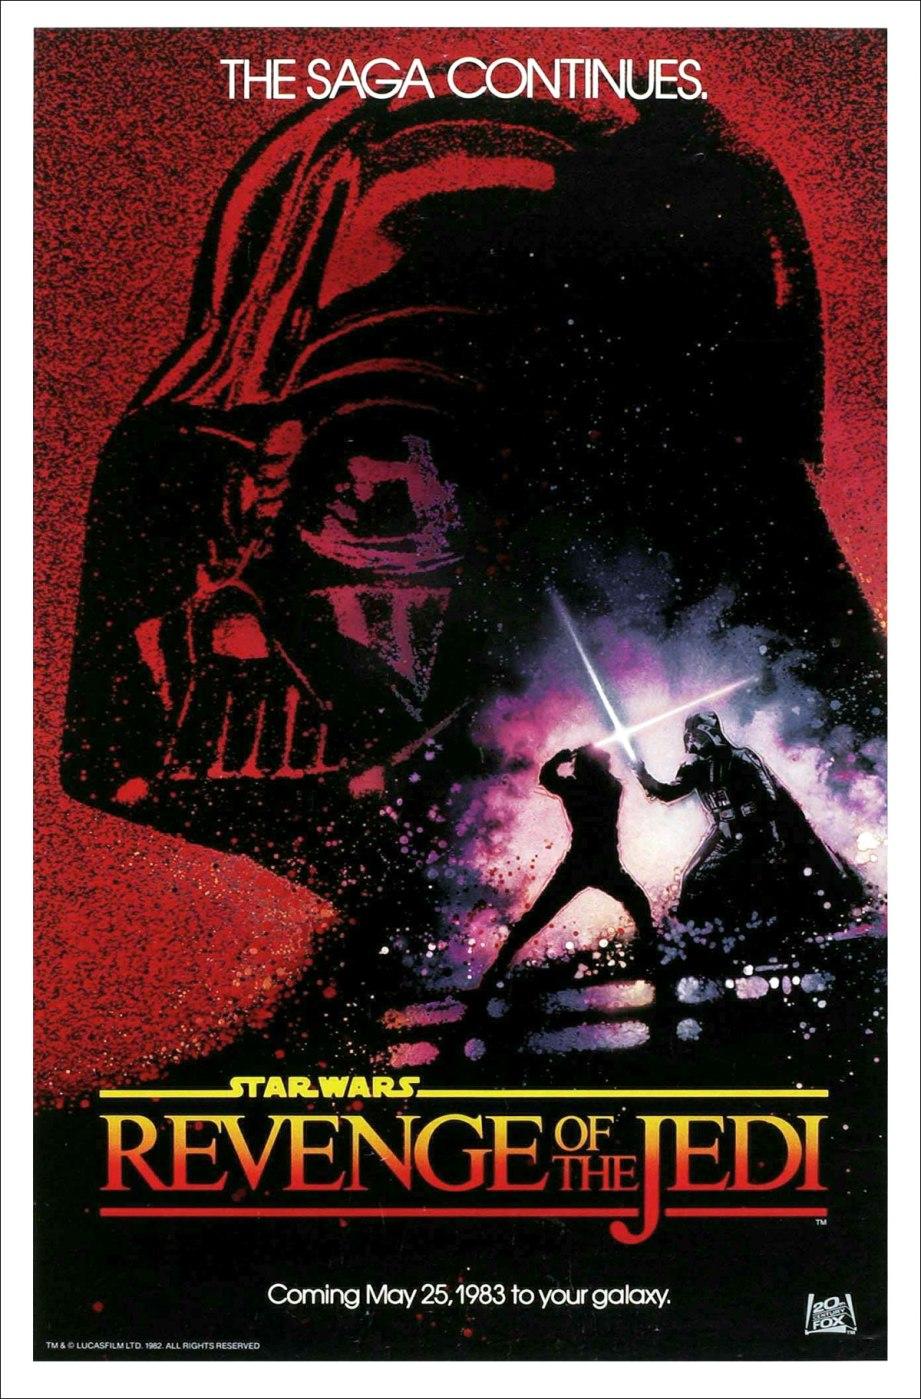 star-wars-revenge-of-the-jedi-poster